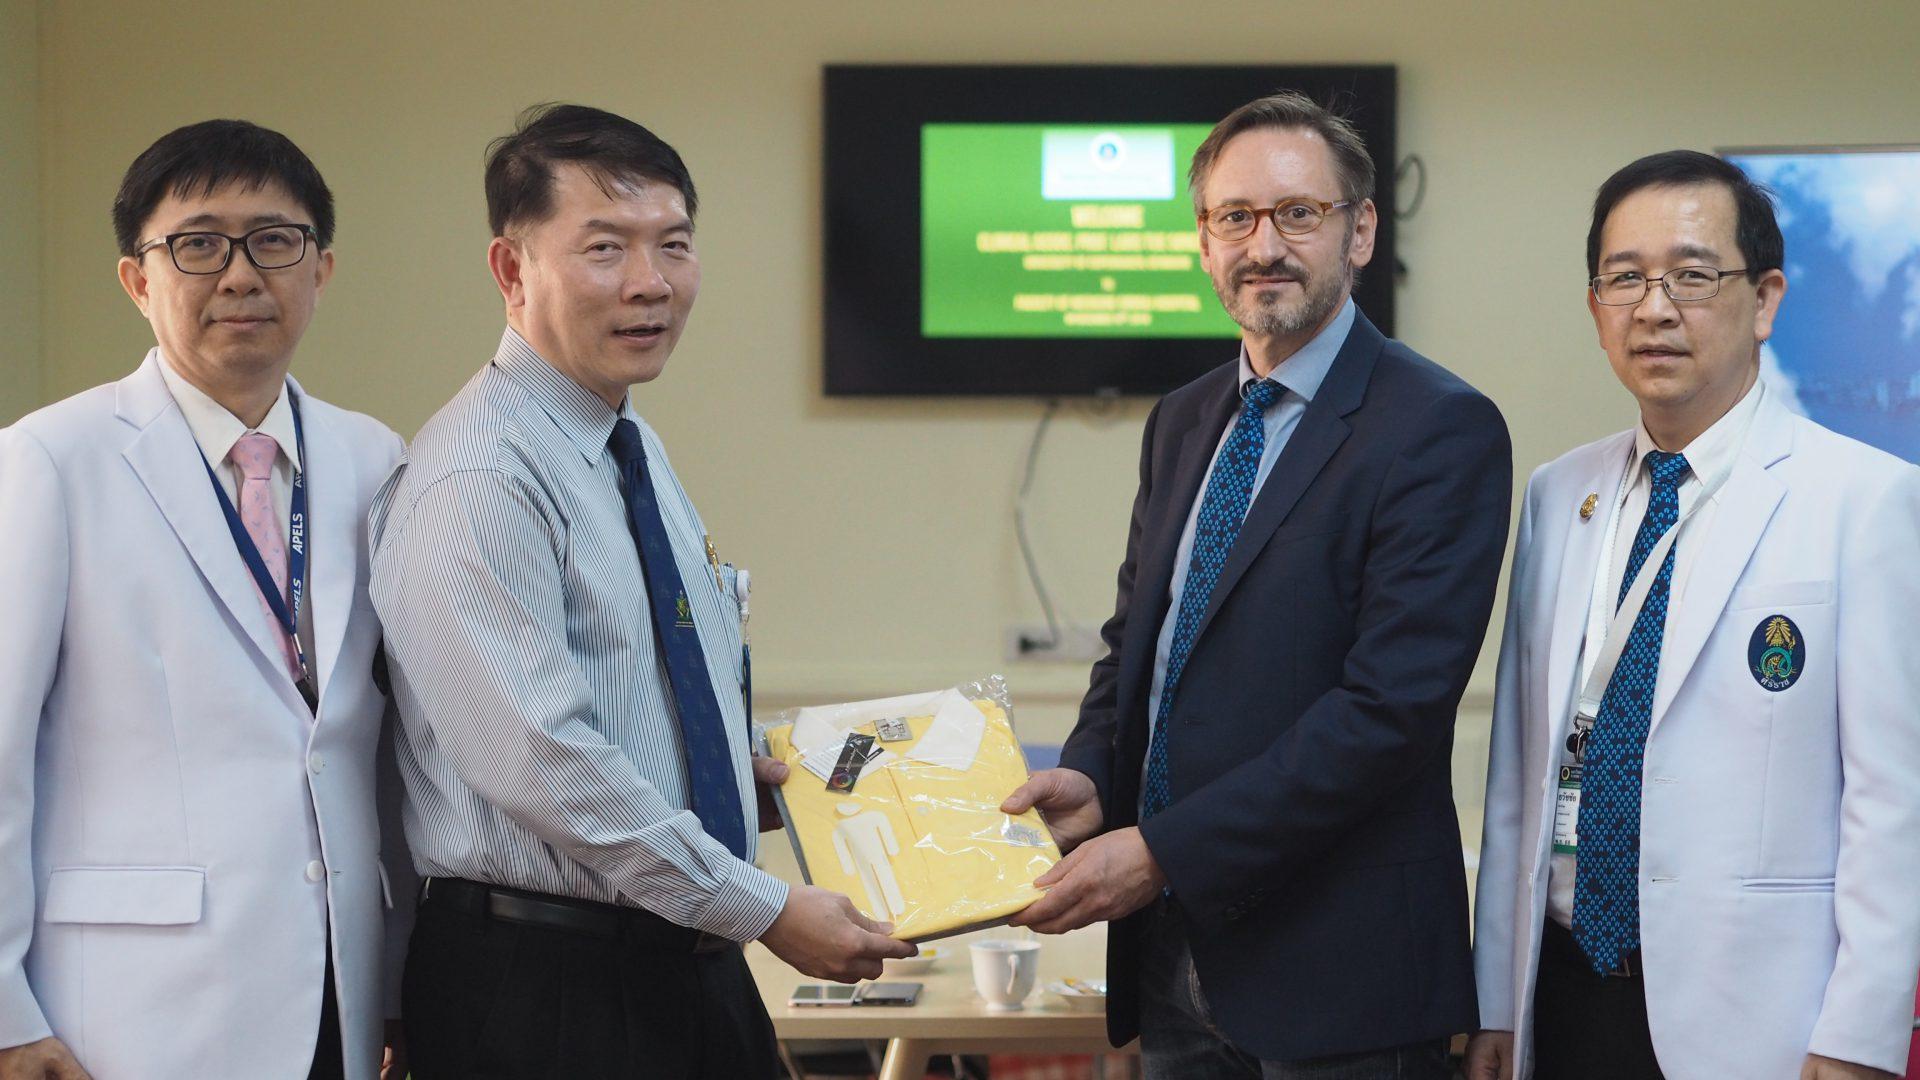 Professor of University of Copenhagen, Denmark Visits Siriraj